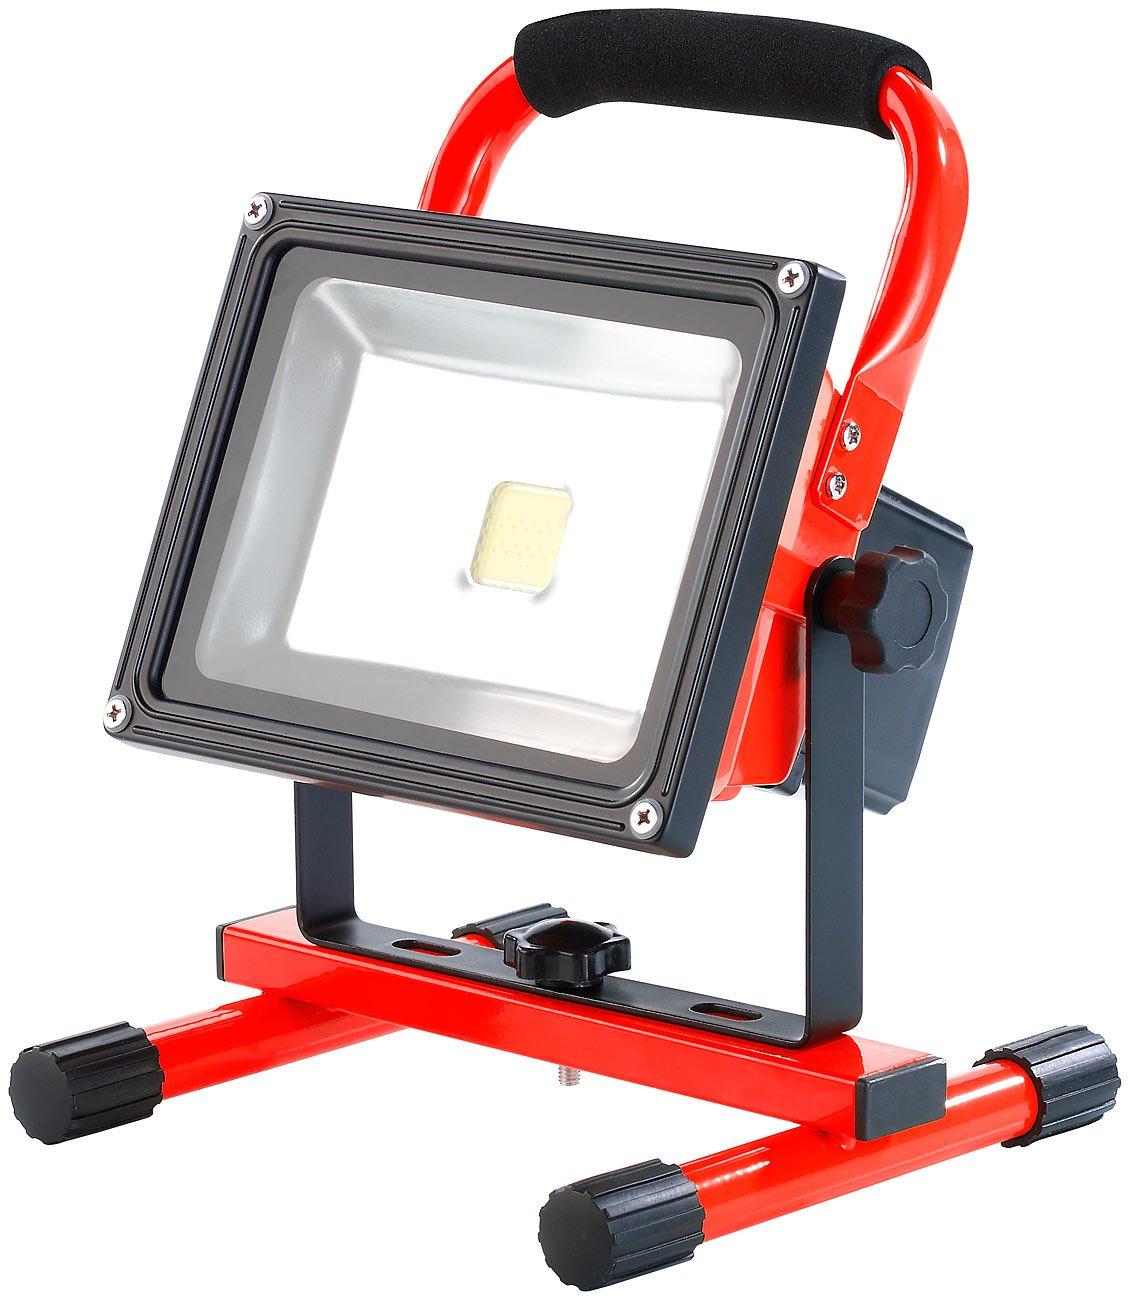 AGT LED Strahler Werkstatt: LED Akku Werkstatt Fluter 20 W, IP44 1300Lumen 5000K (Arbeitsleuchten) [Energieklasse A]